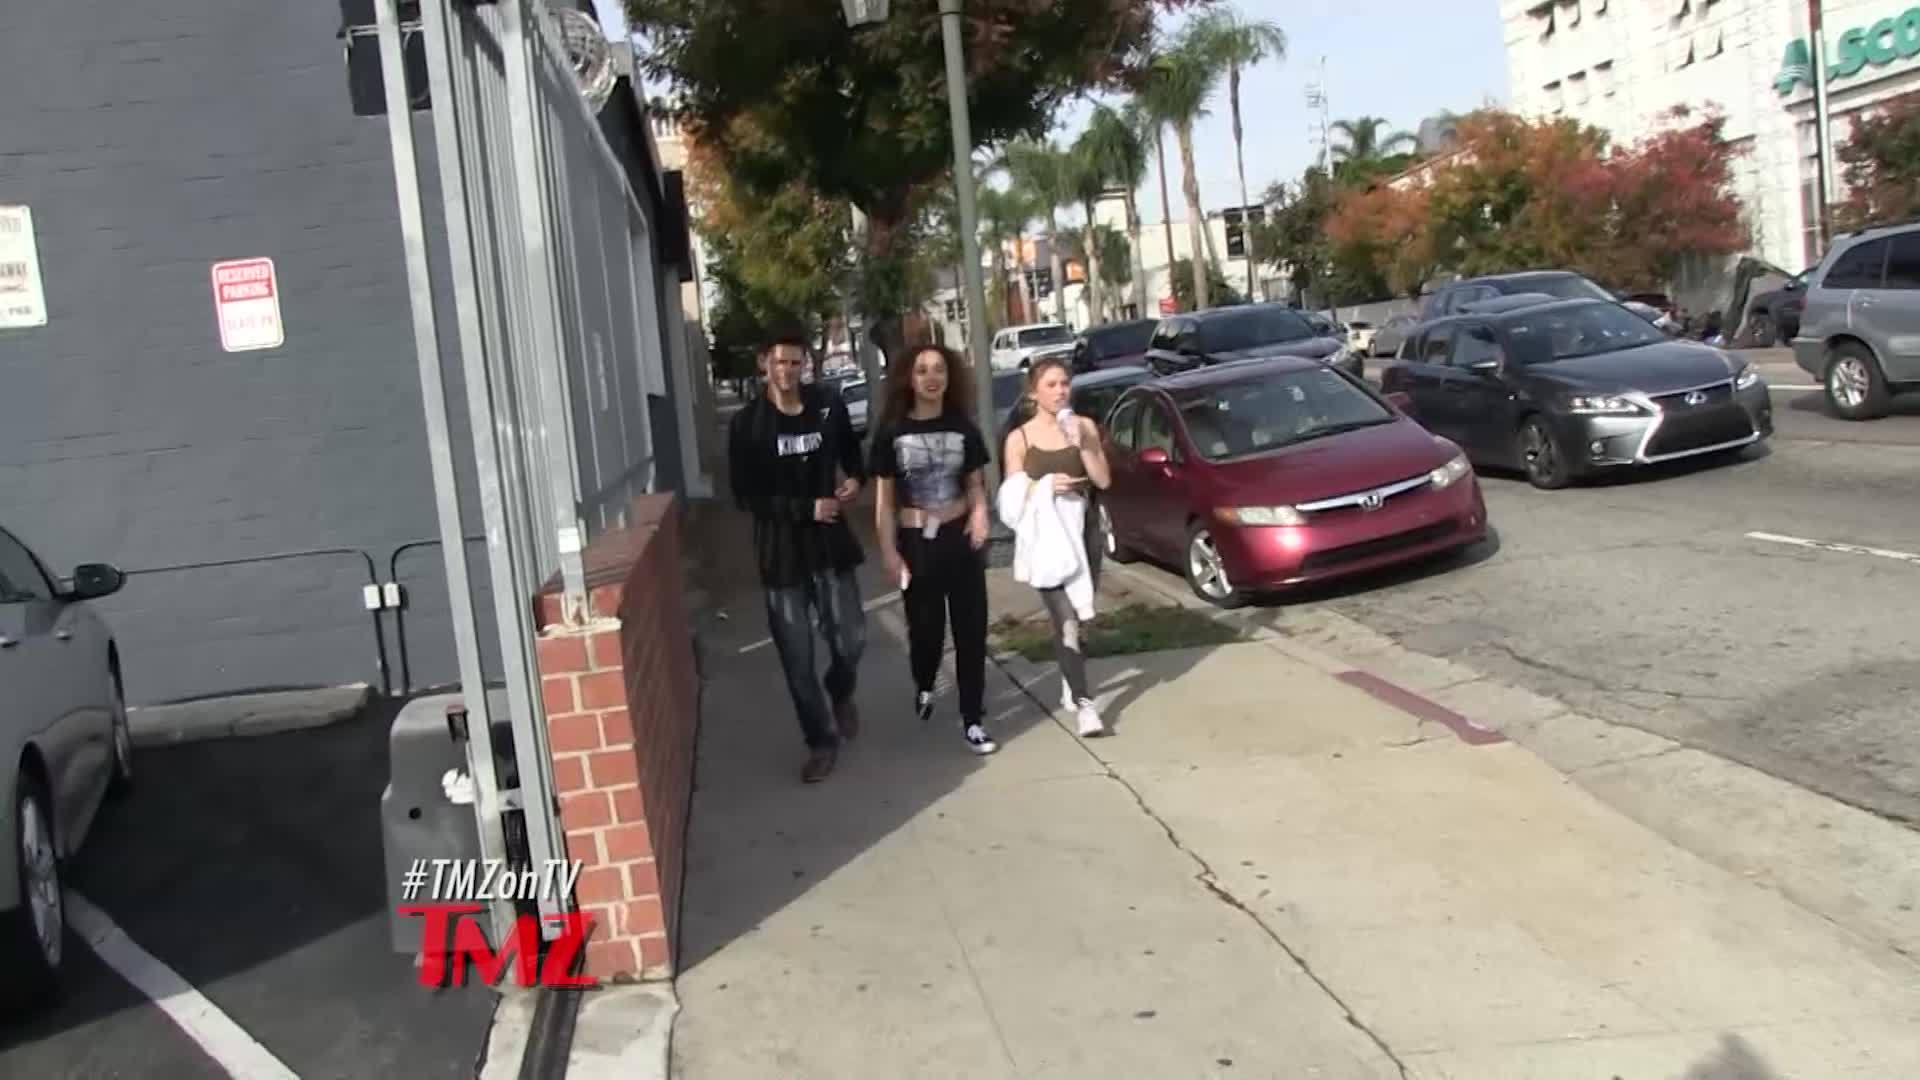 TMZ on Demand | Ryan Garcia Gives a S/O to Selena Gomez